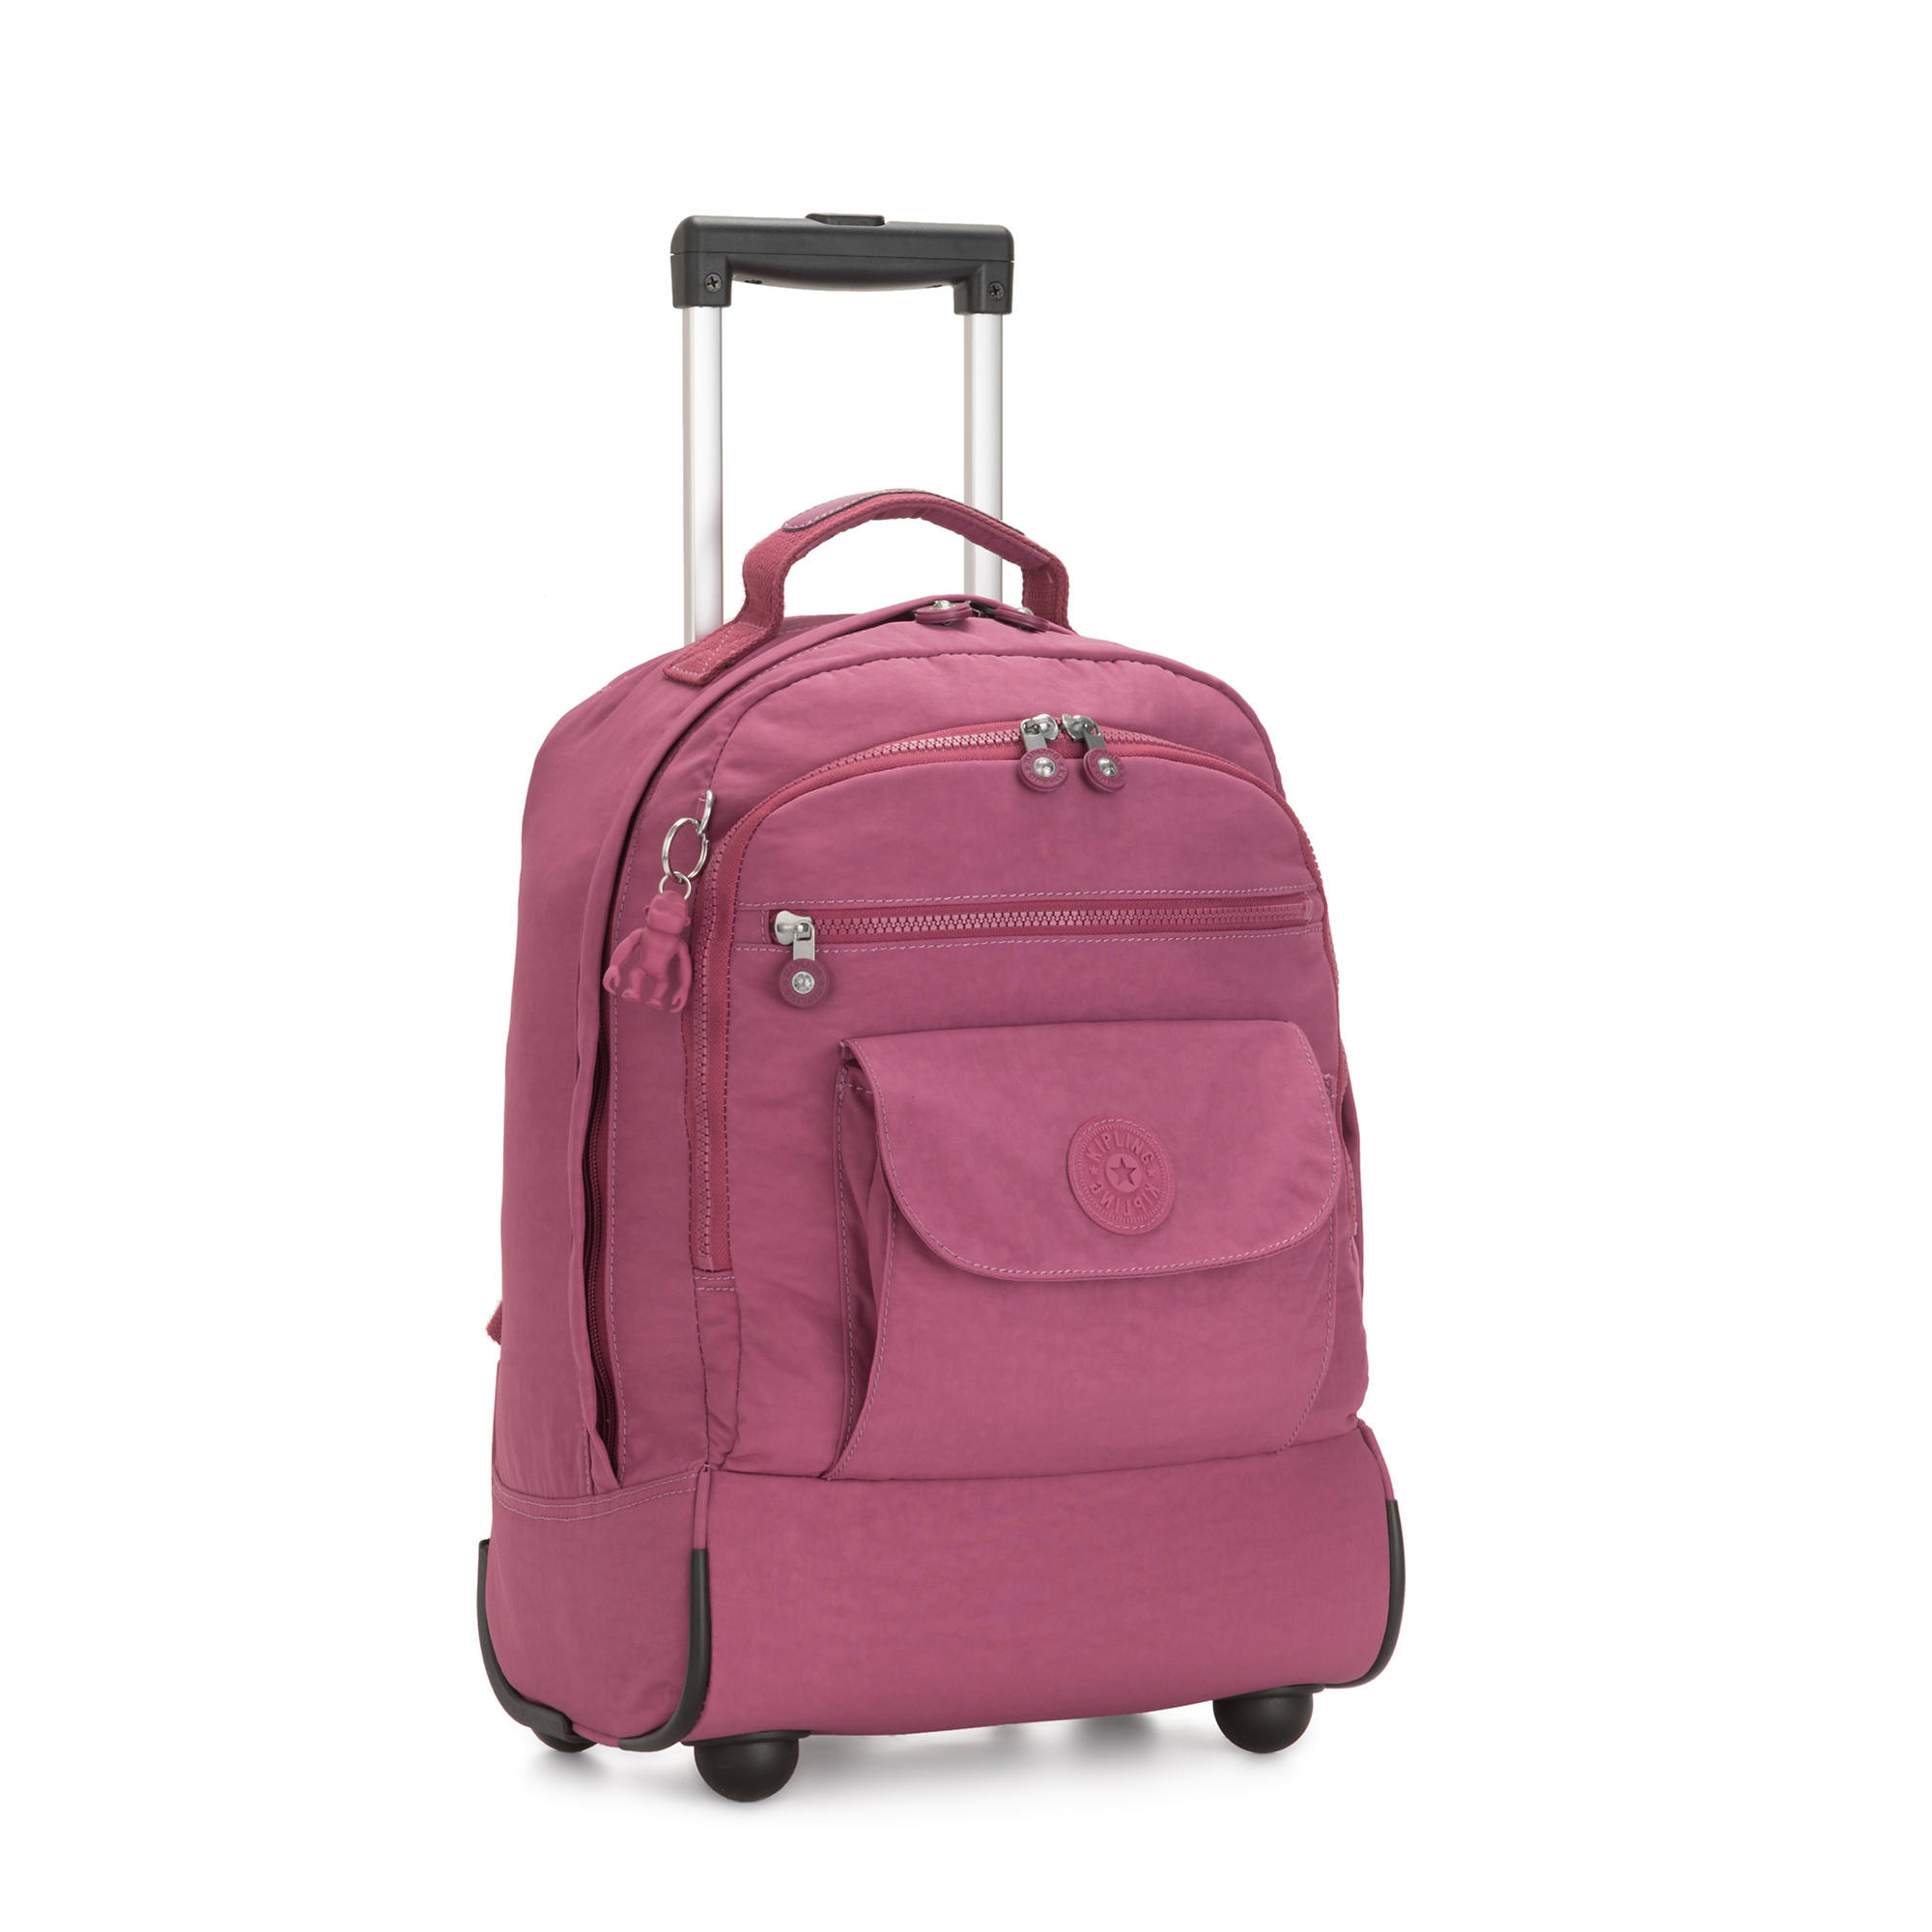 Santa Fe Wheeled Backpack | Airline International Luggage